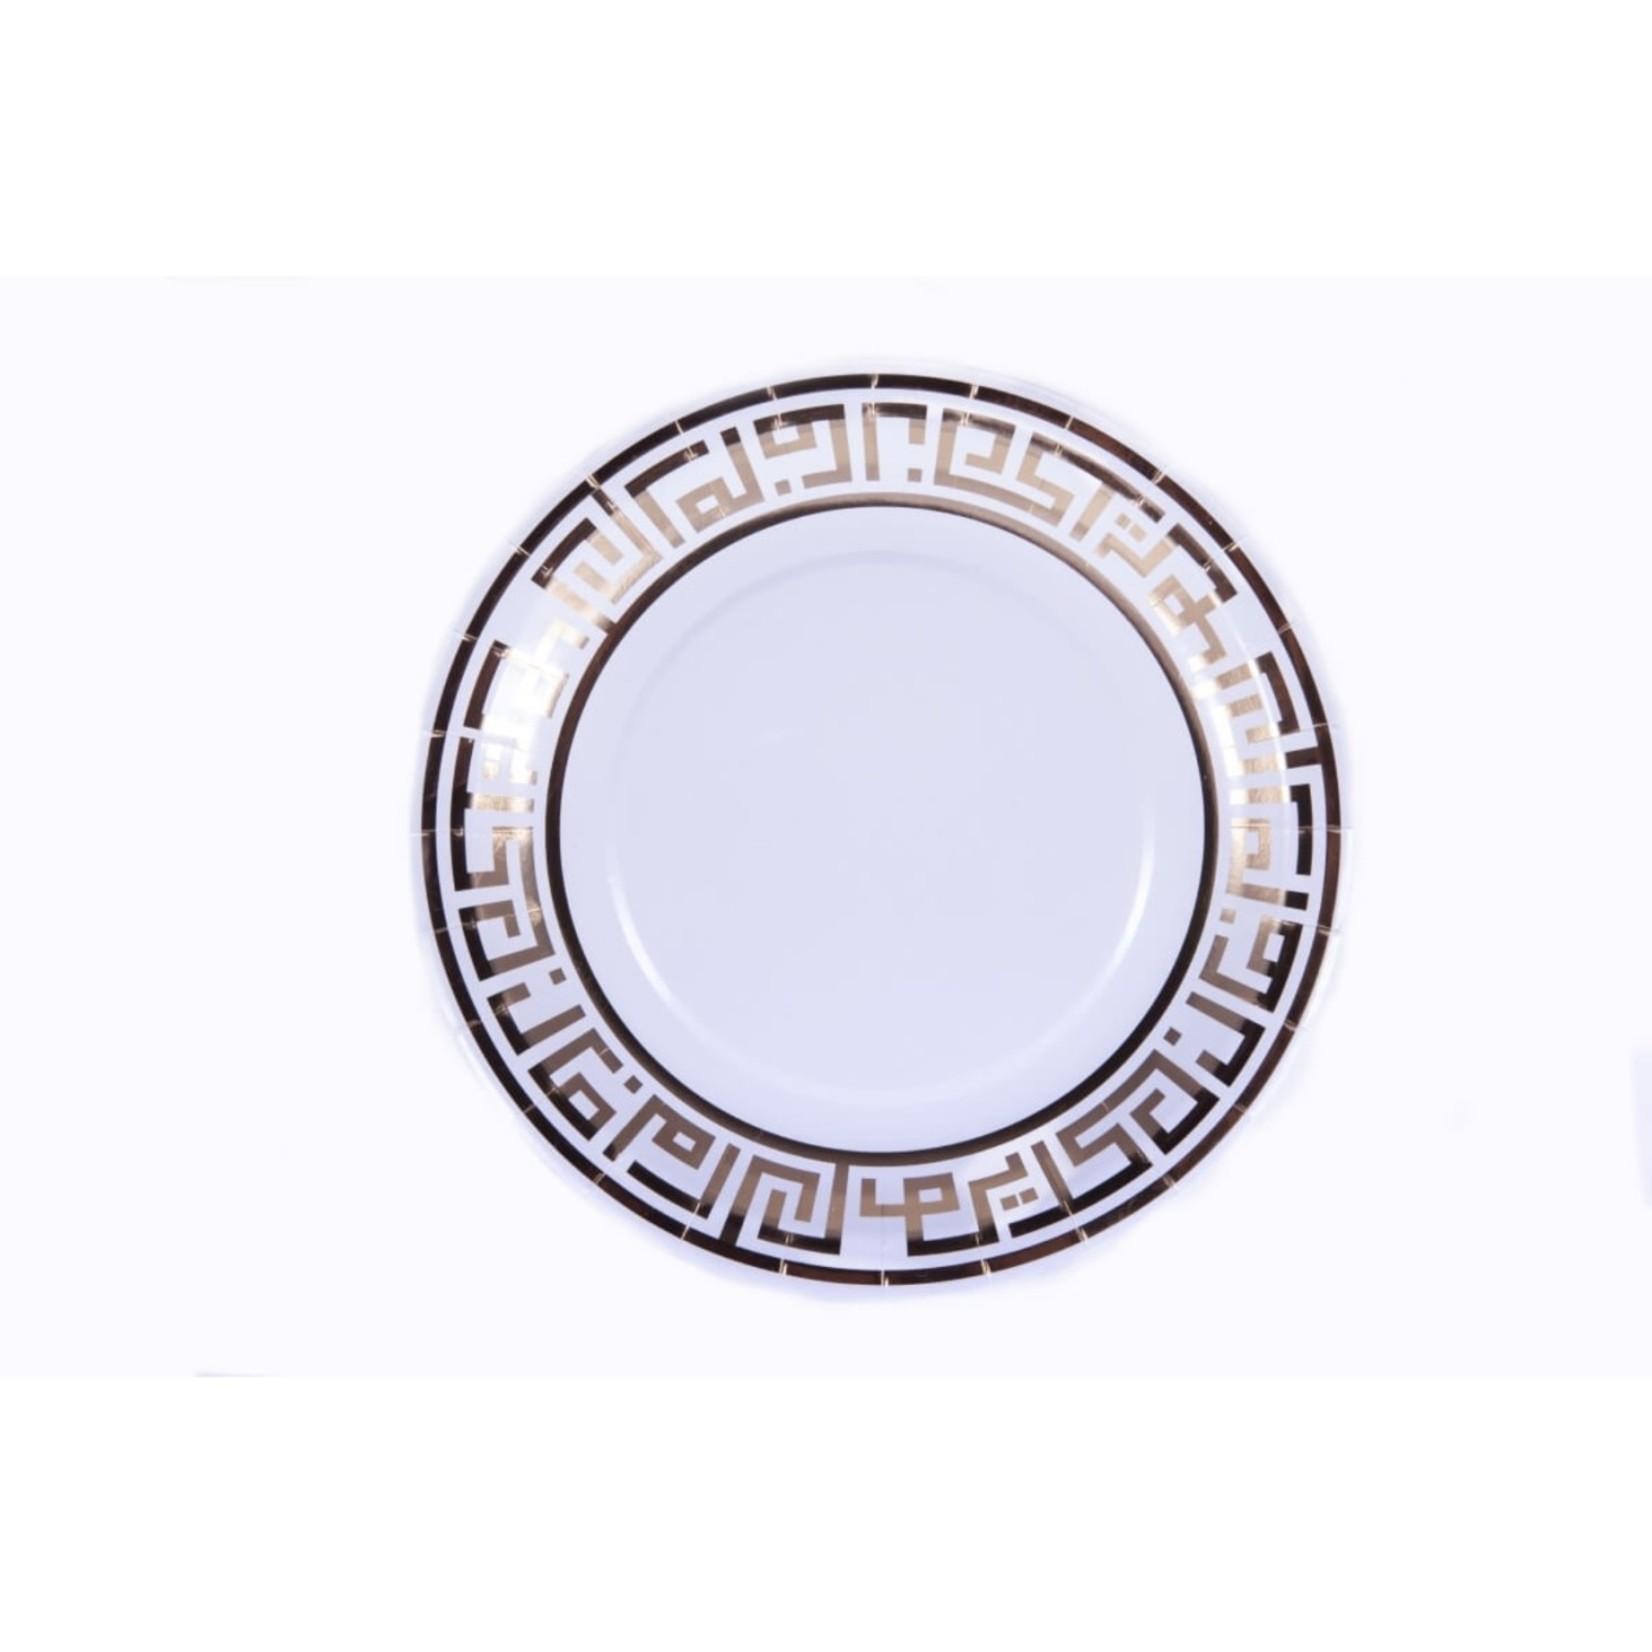 Eid Creations Mashrabiya Dinner Plates